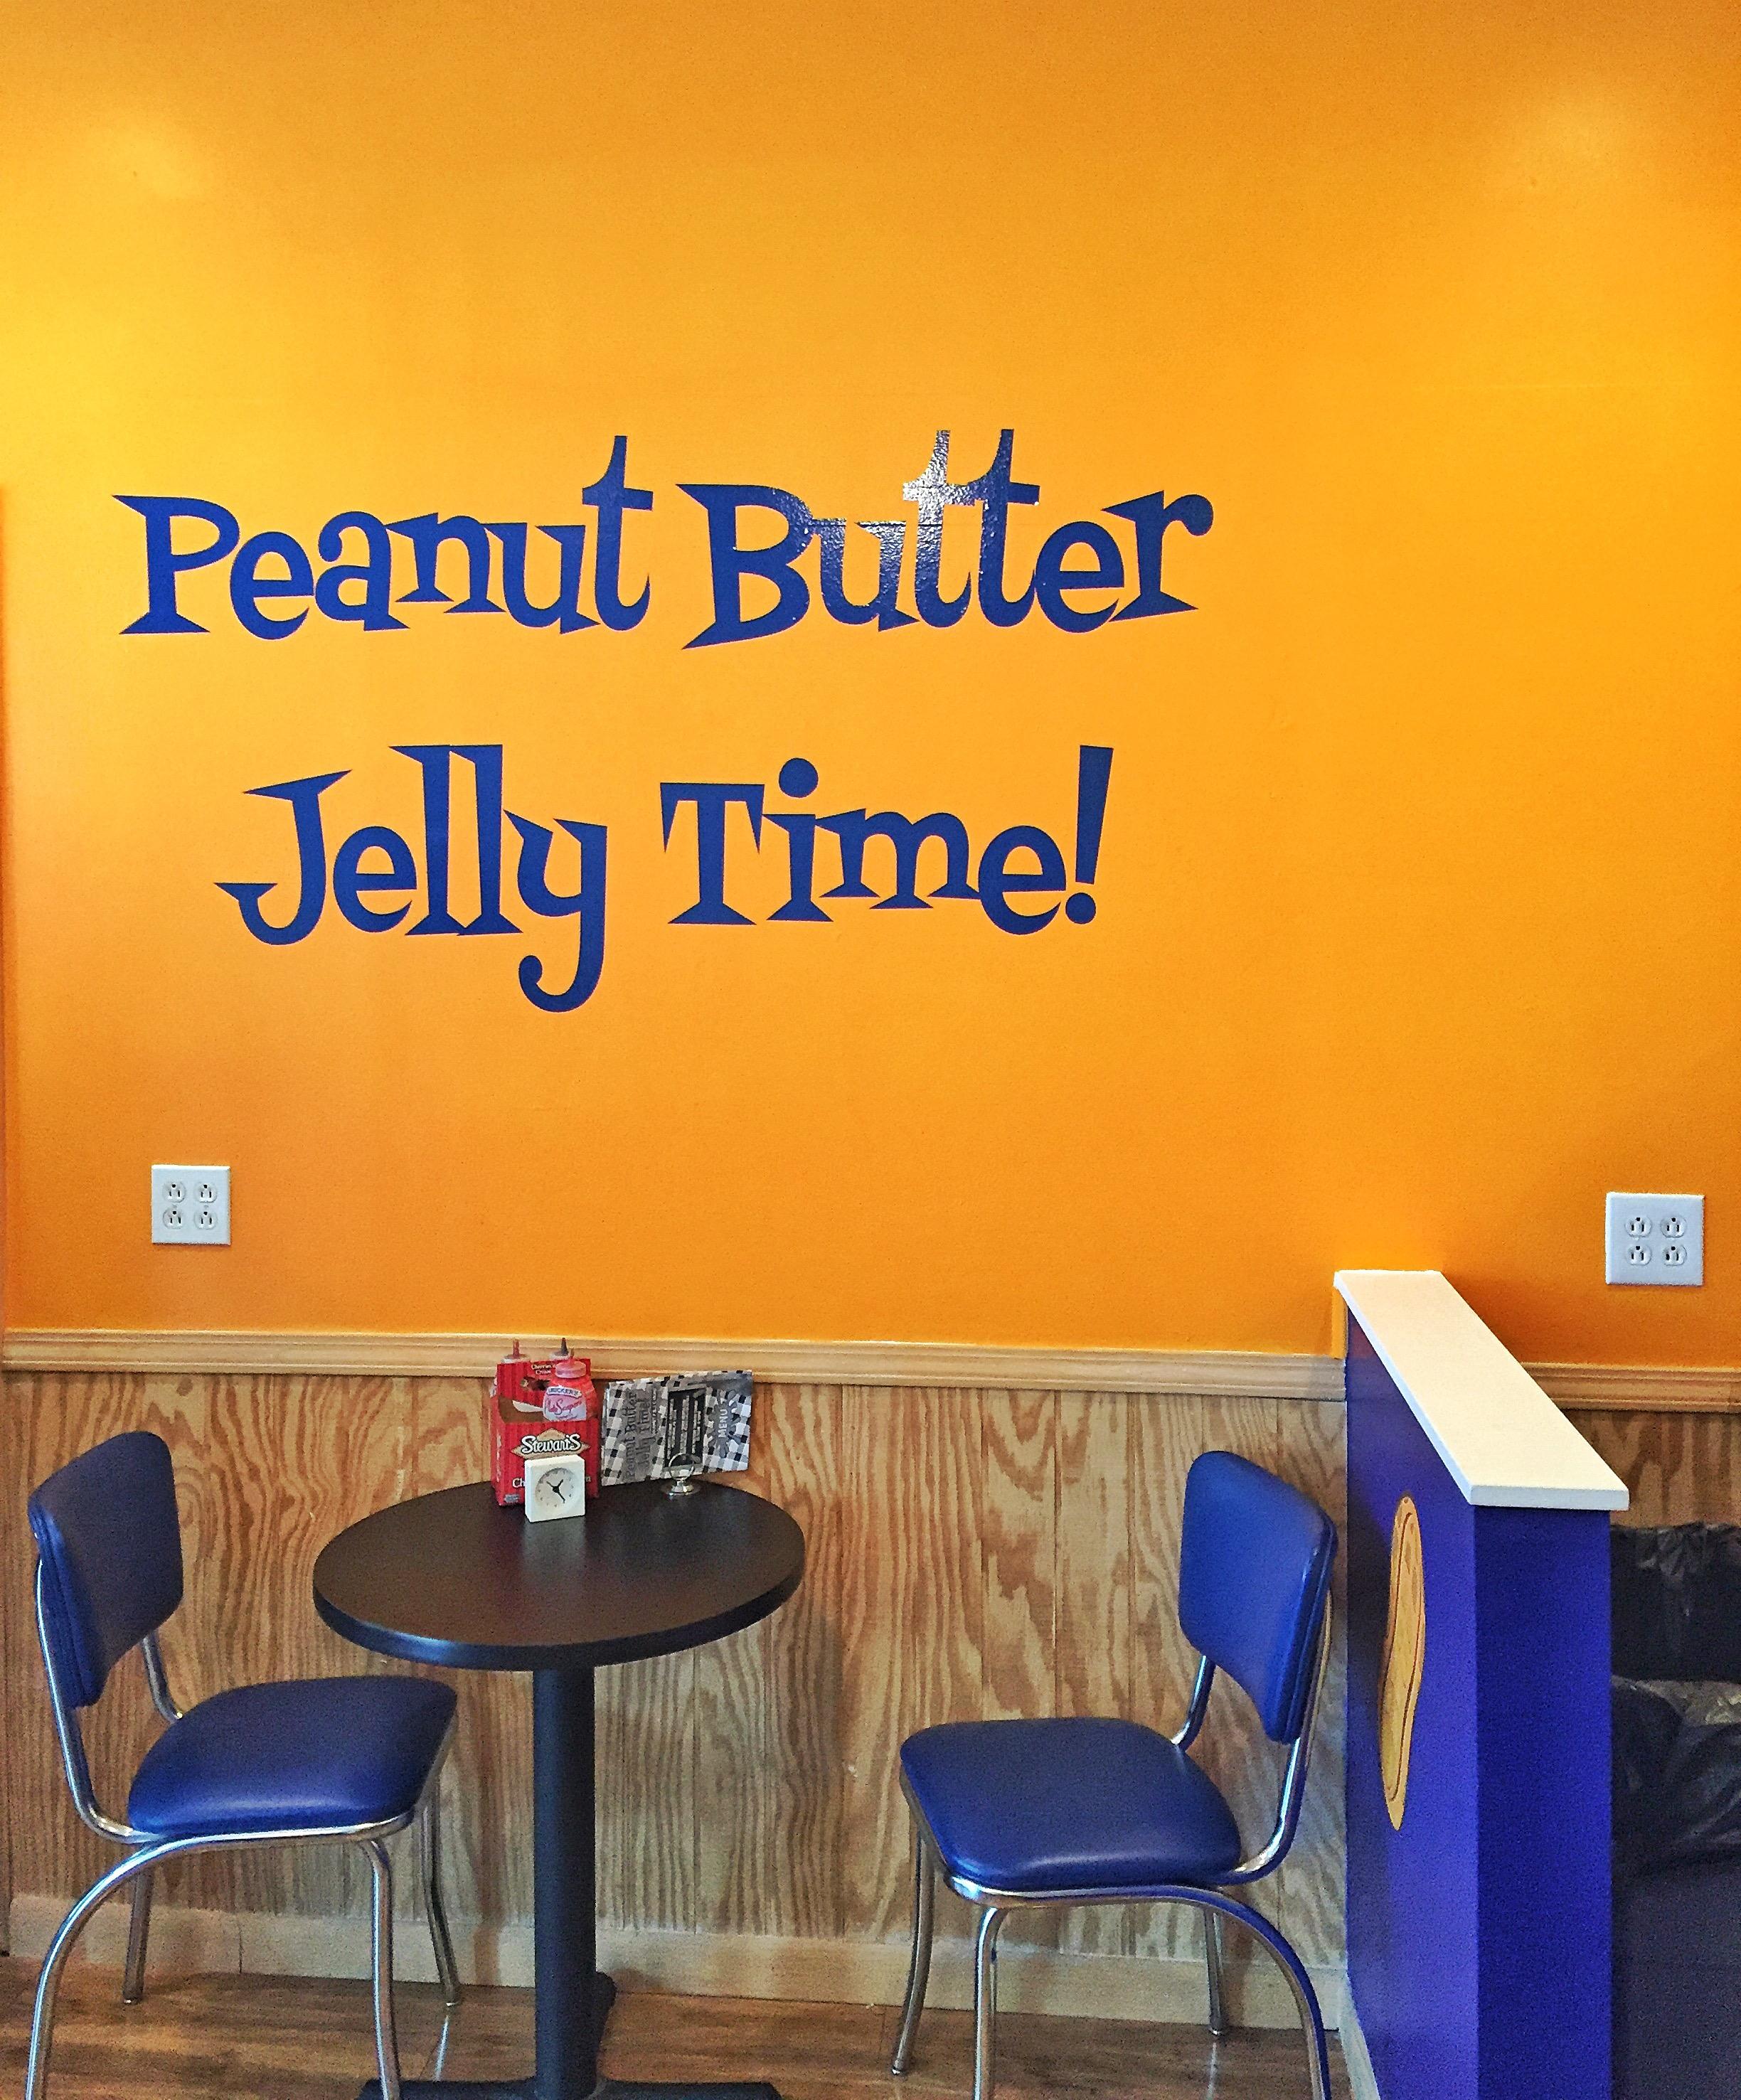 Peanut Butter Jelly Time.JPG